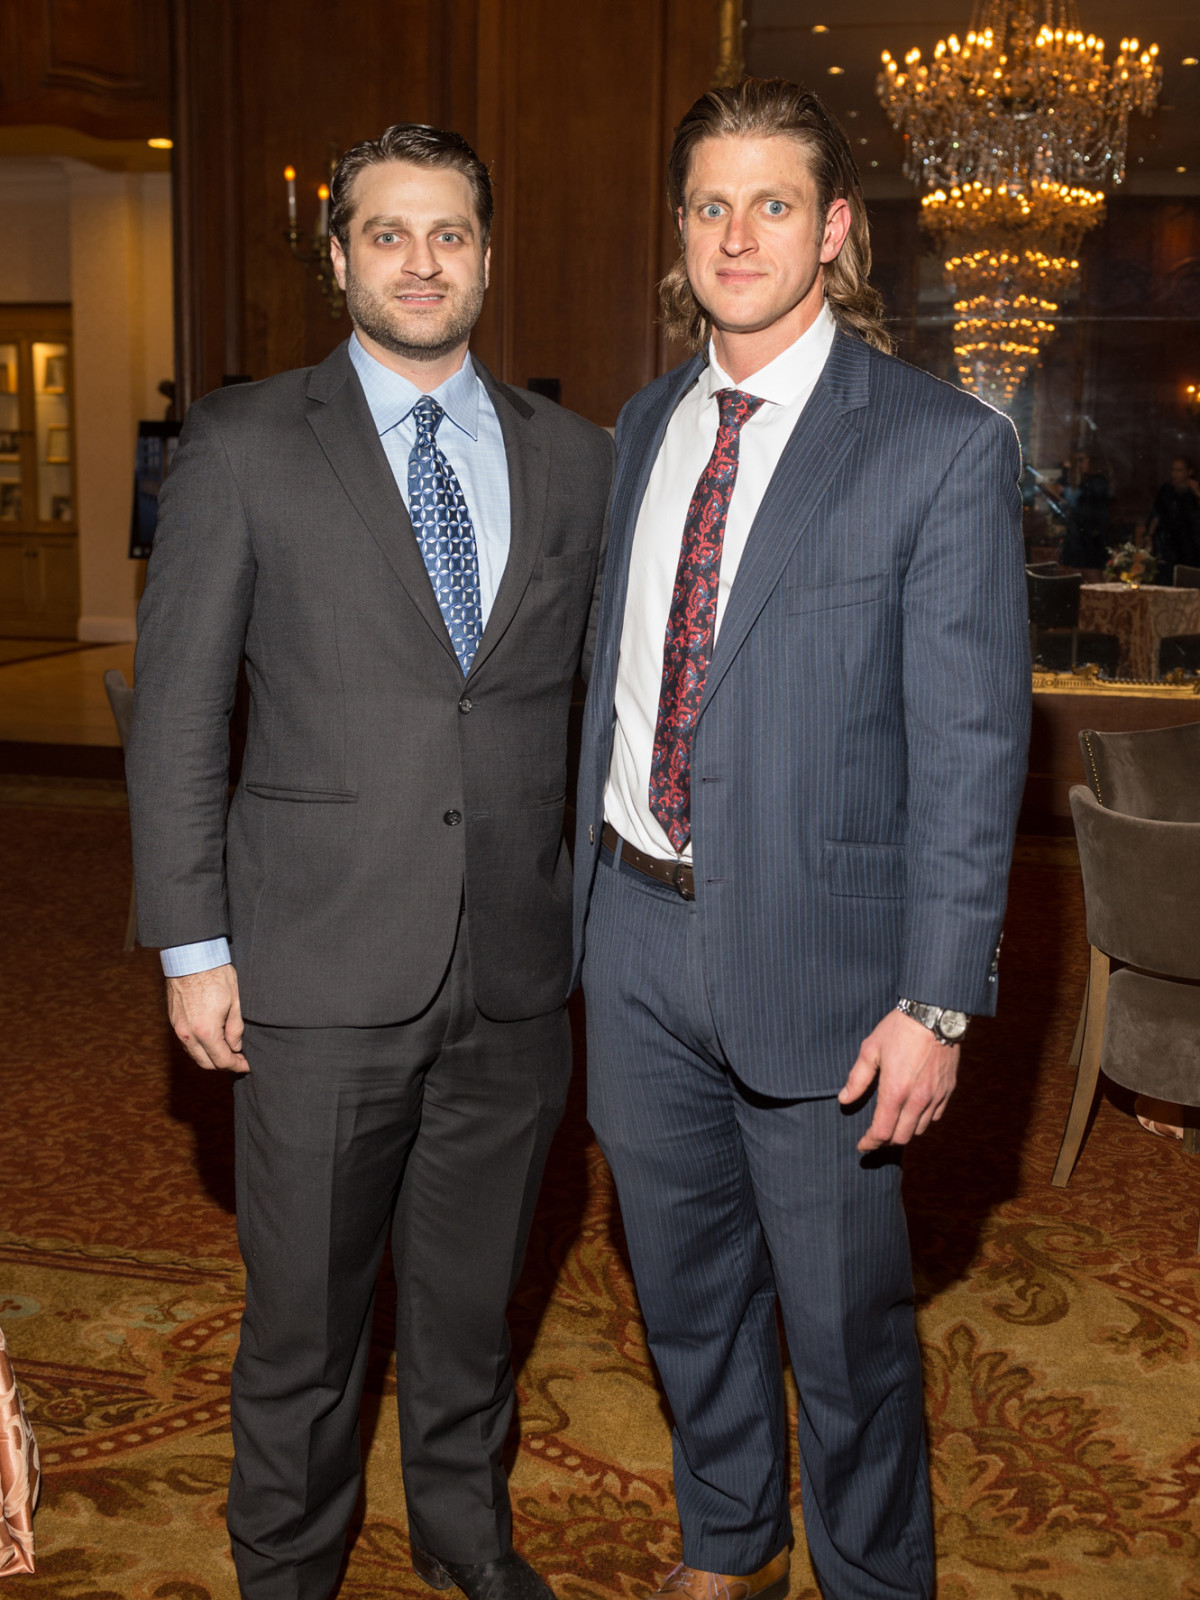 Mark Zimmerman and Dan Zimmerman